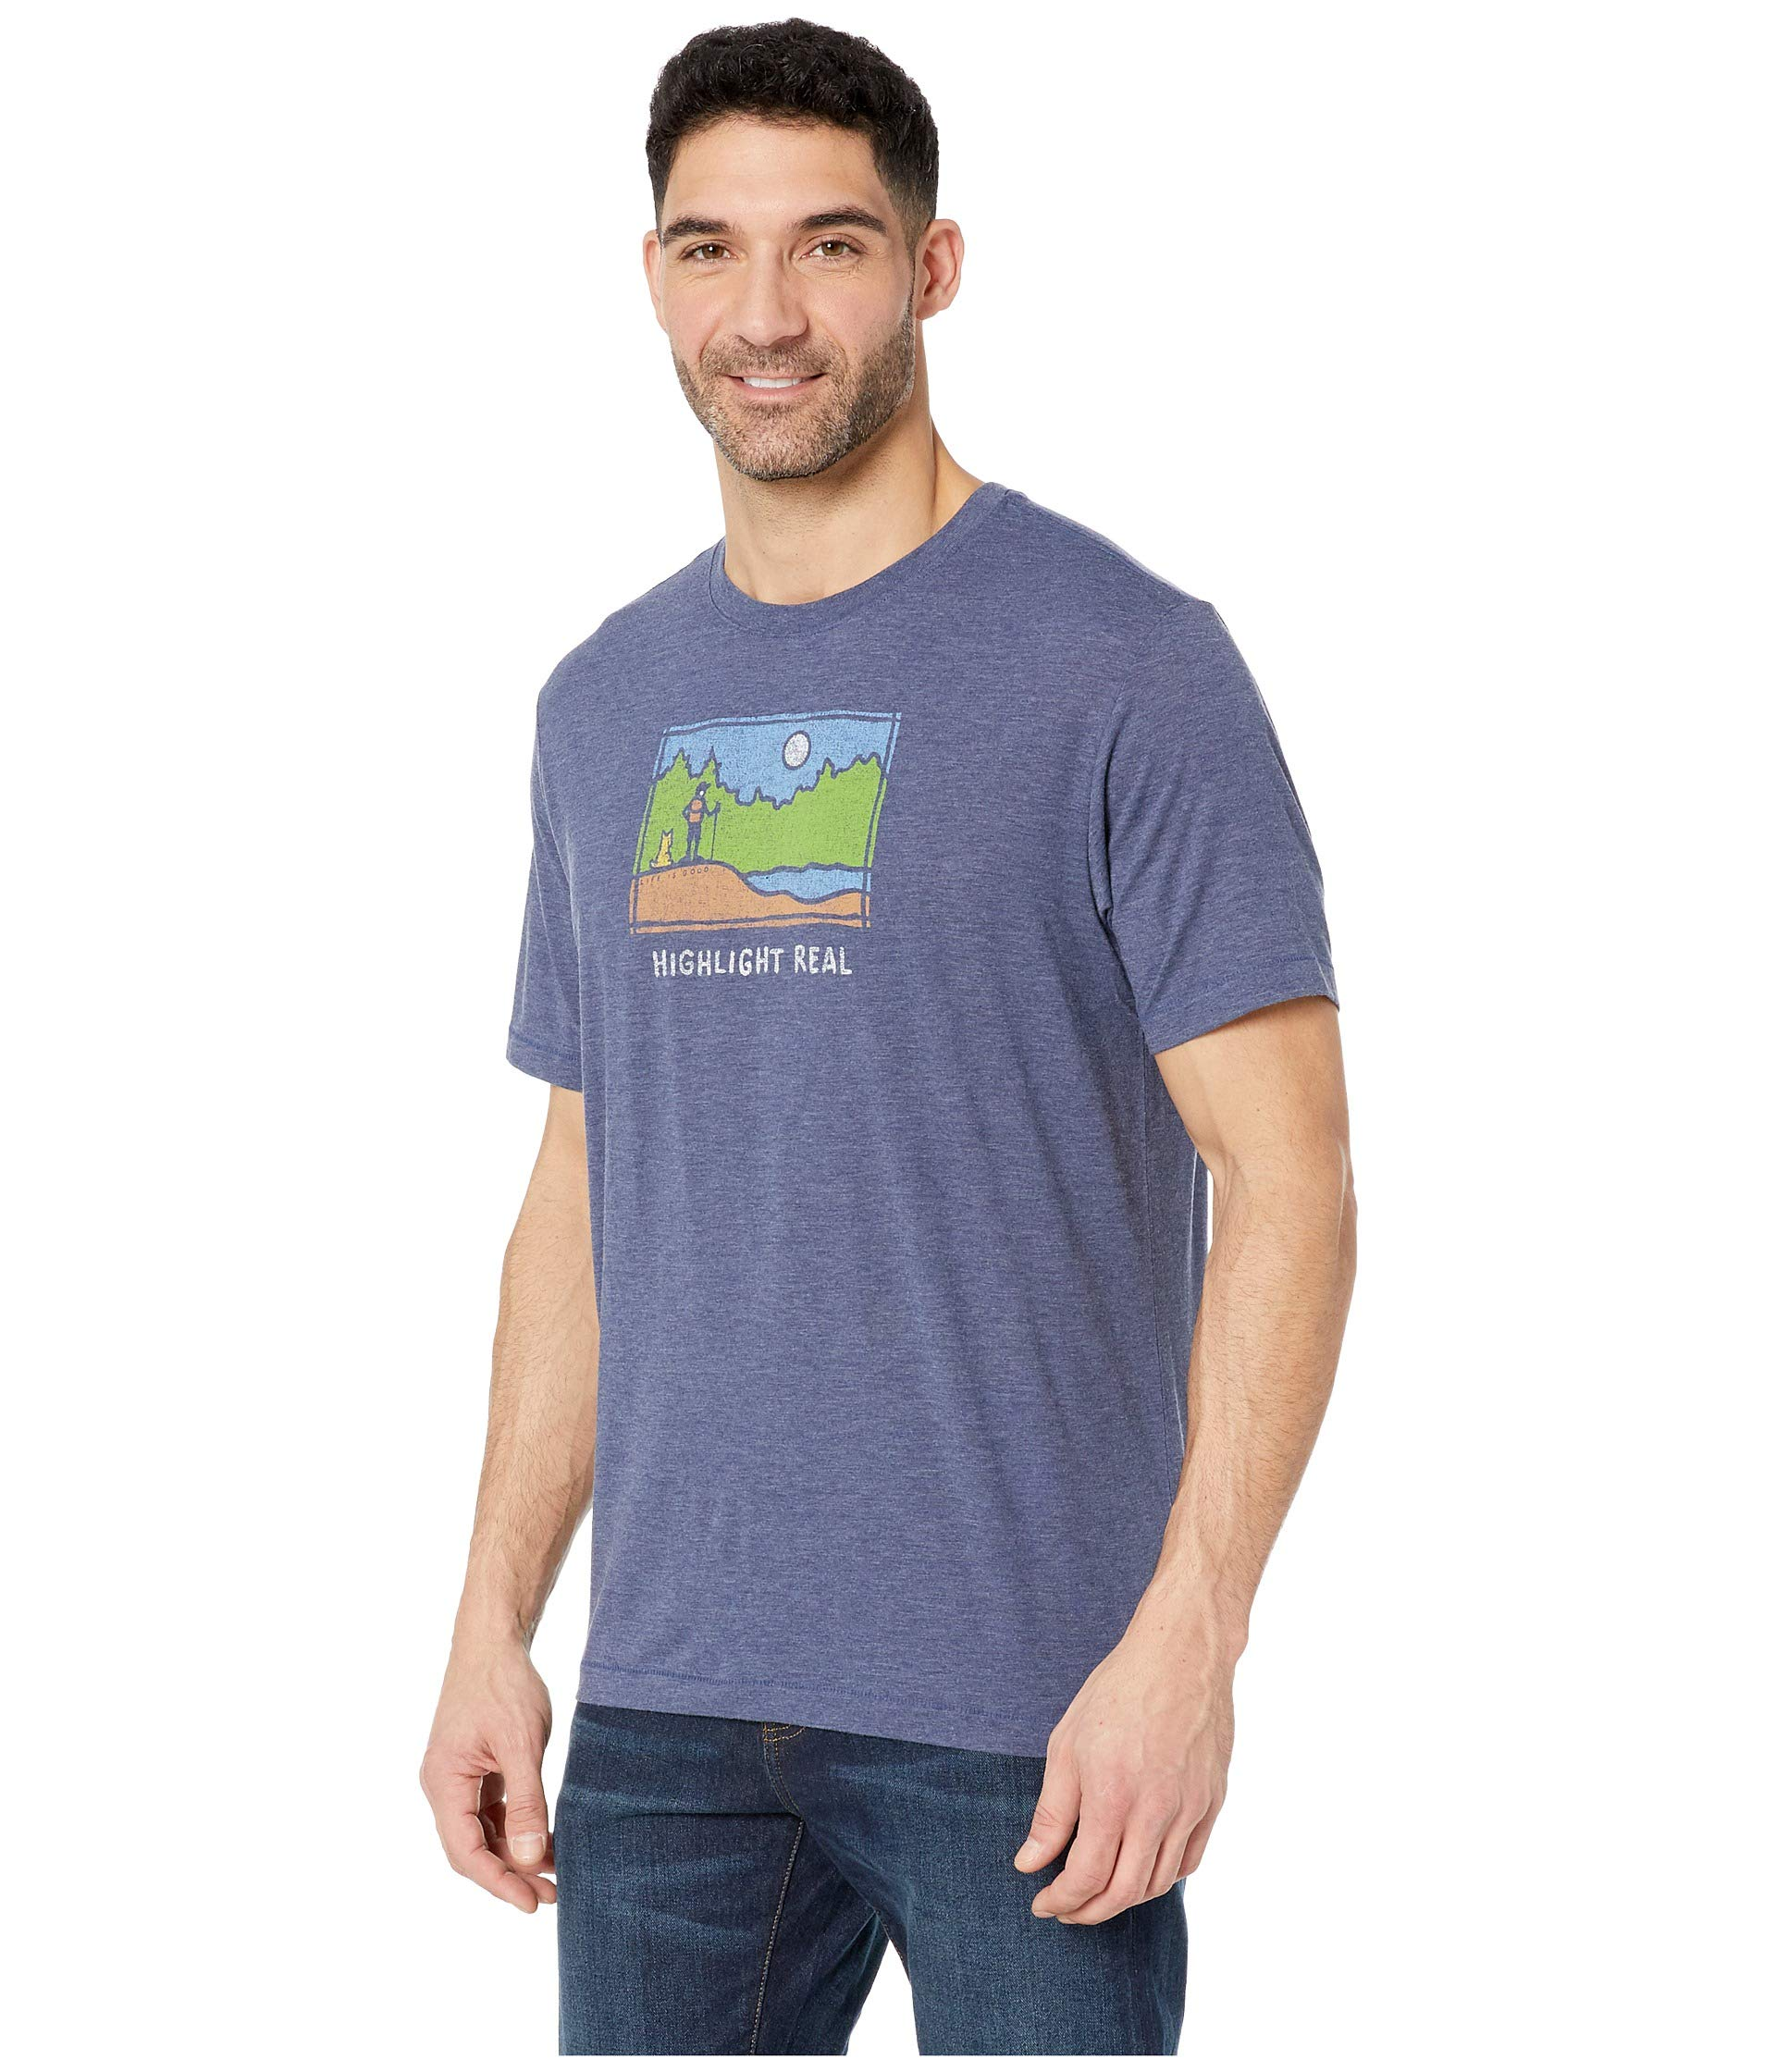 T Cool Good Is shirt Highlight Reel Darkest Blue Life pOCXnaZqw